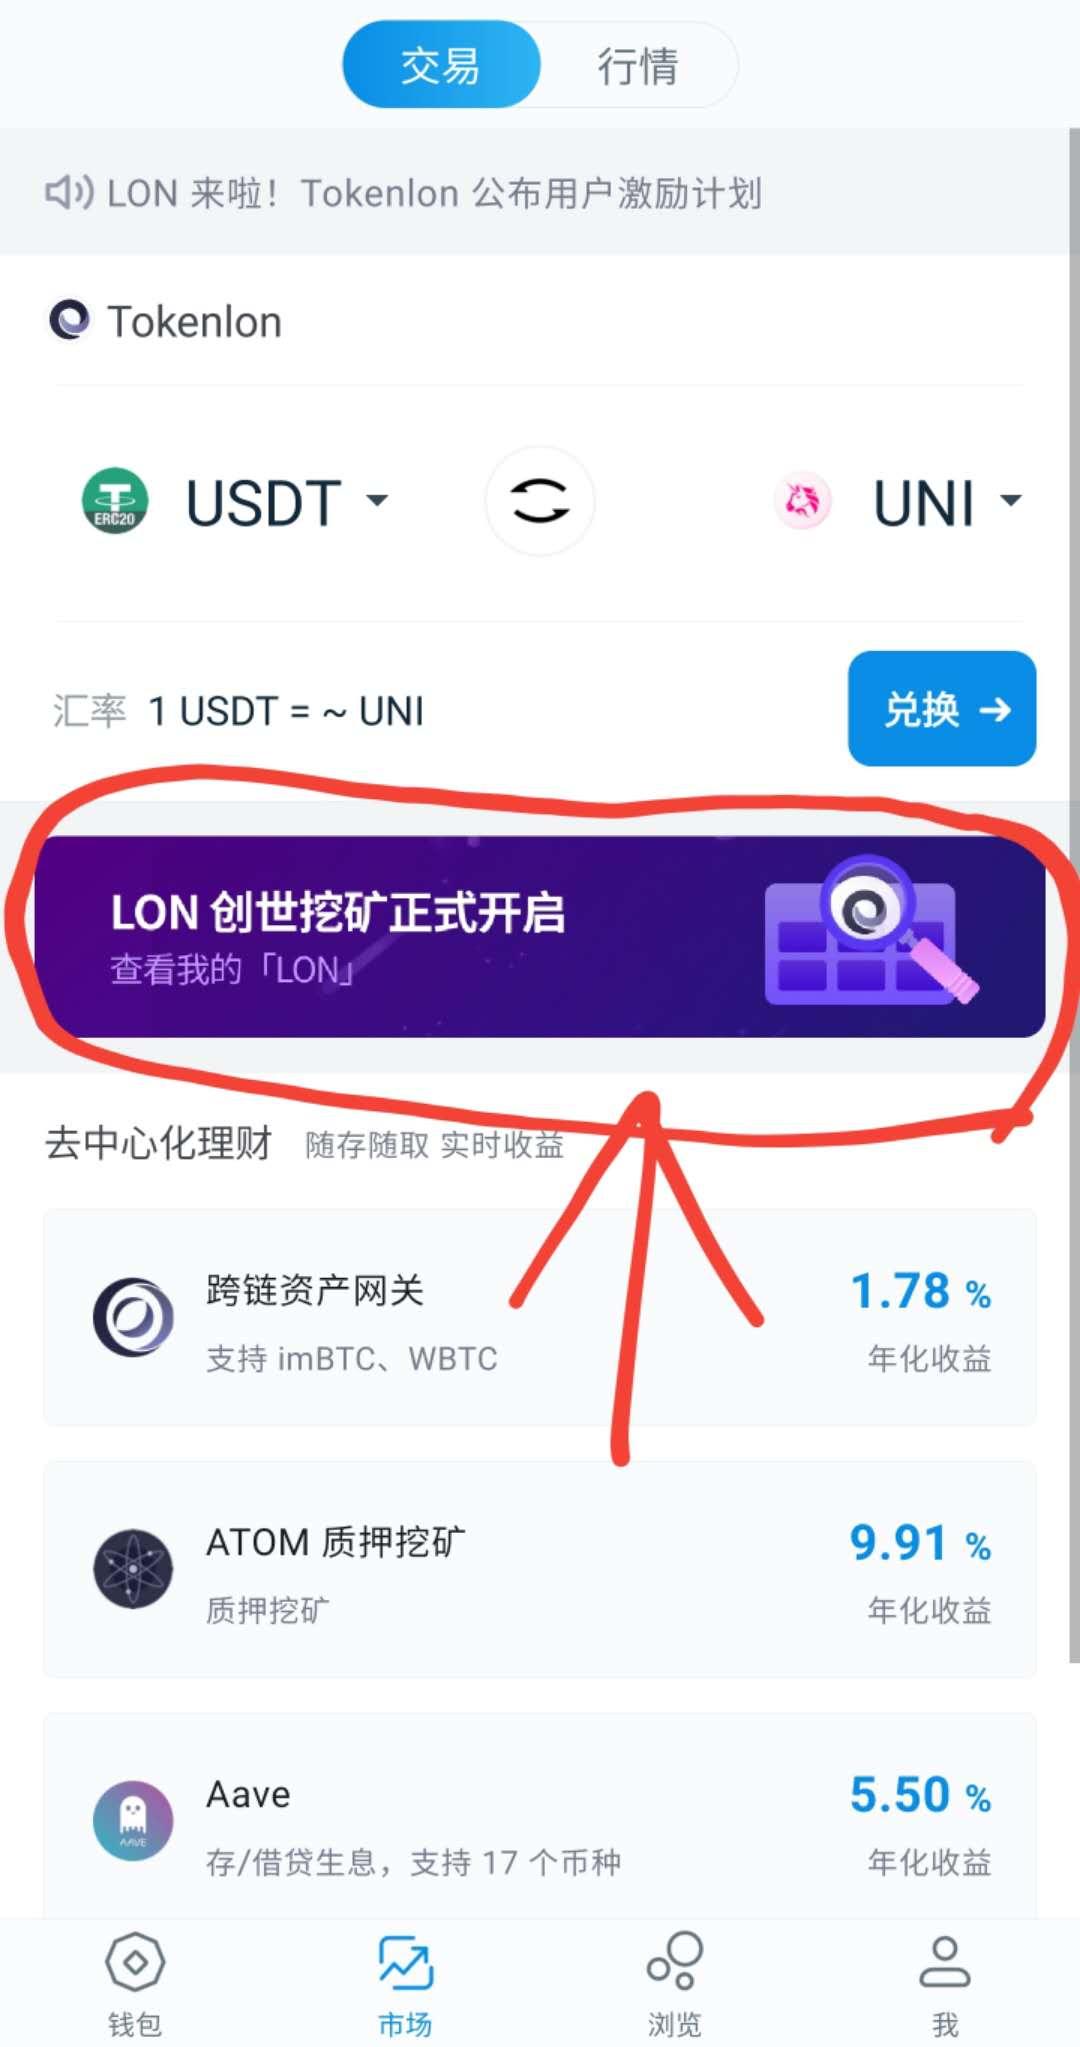 imToken 孵化的 DEX Tokenlon 发布 LON 代币以及用户激励计划,速来挖矿